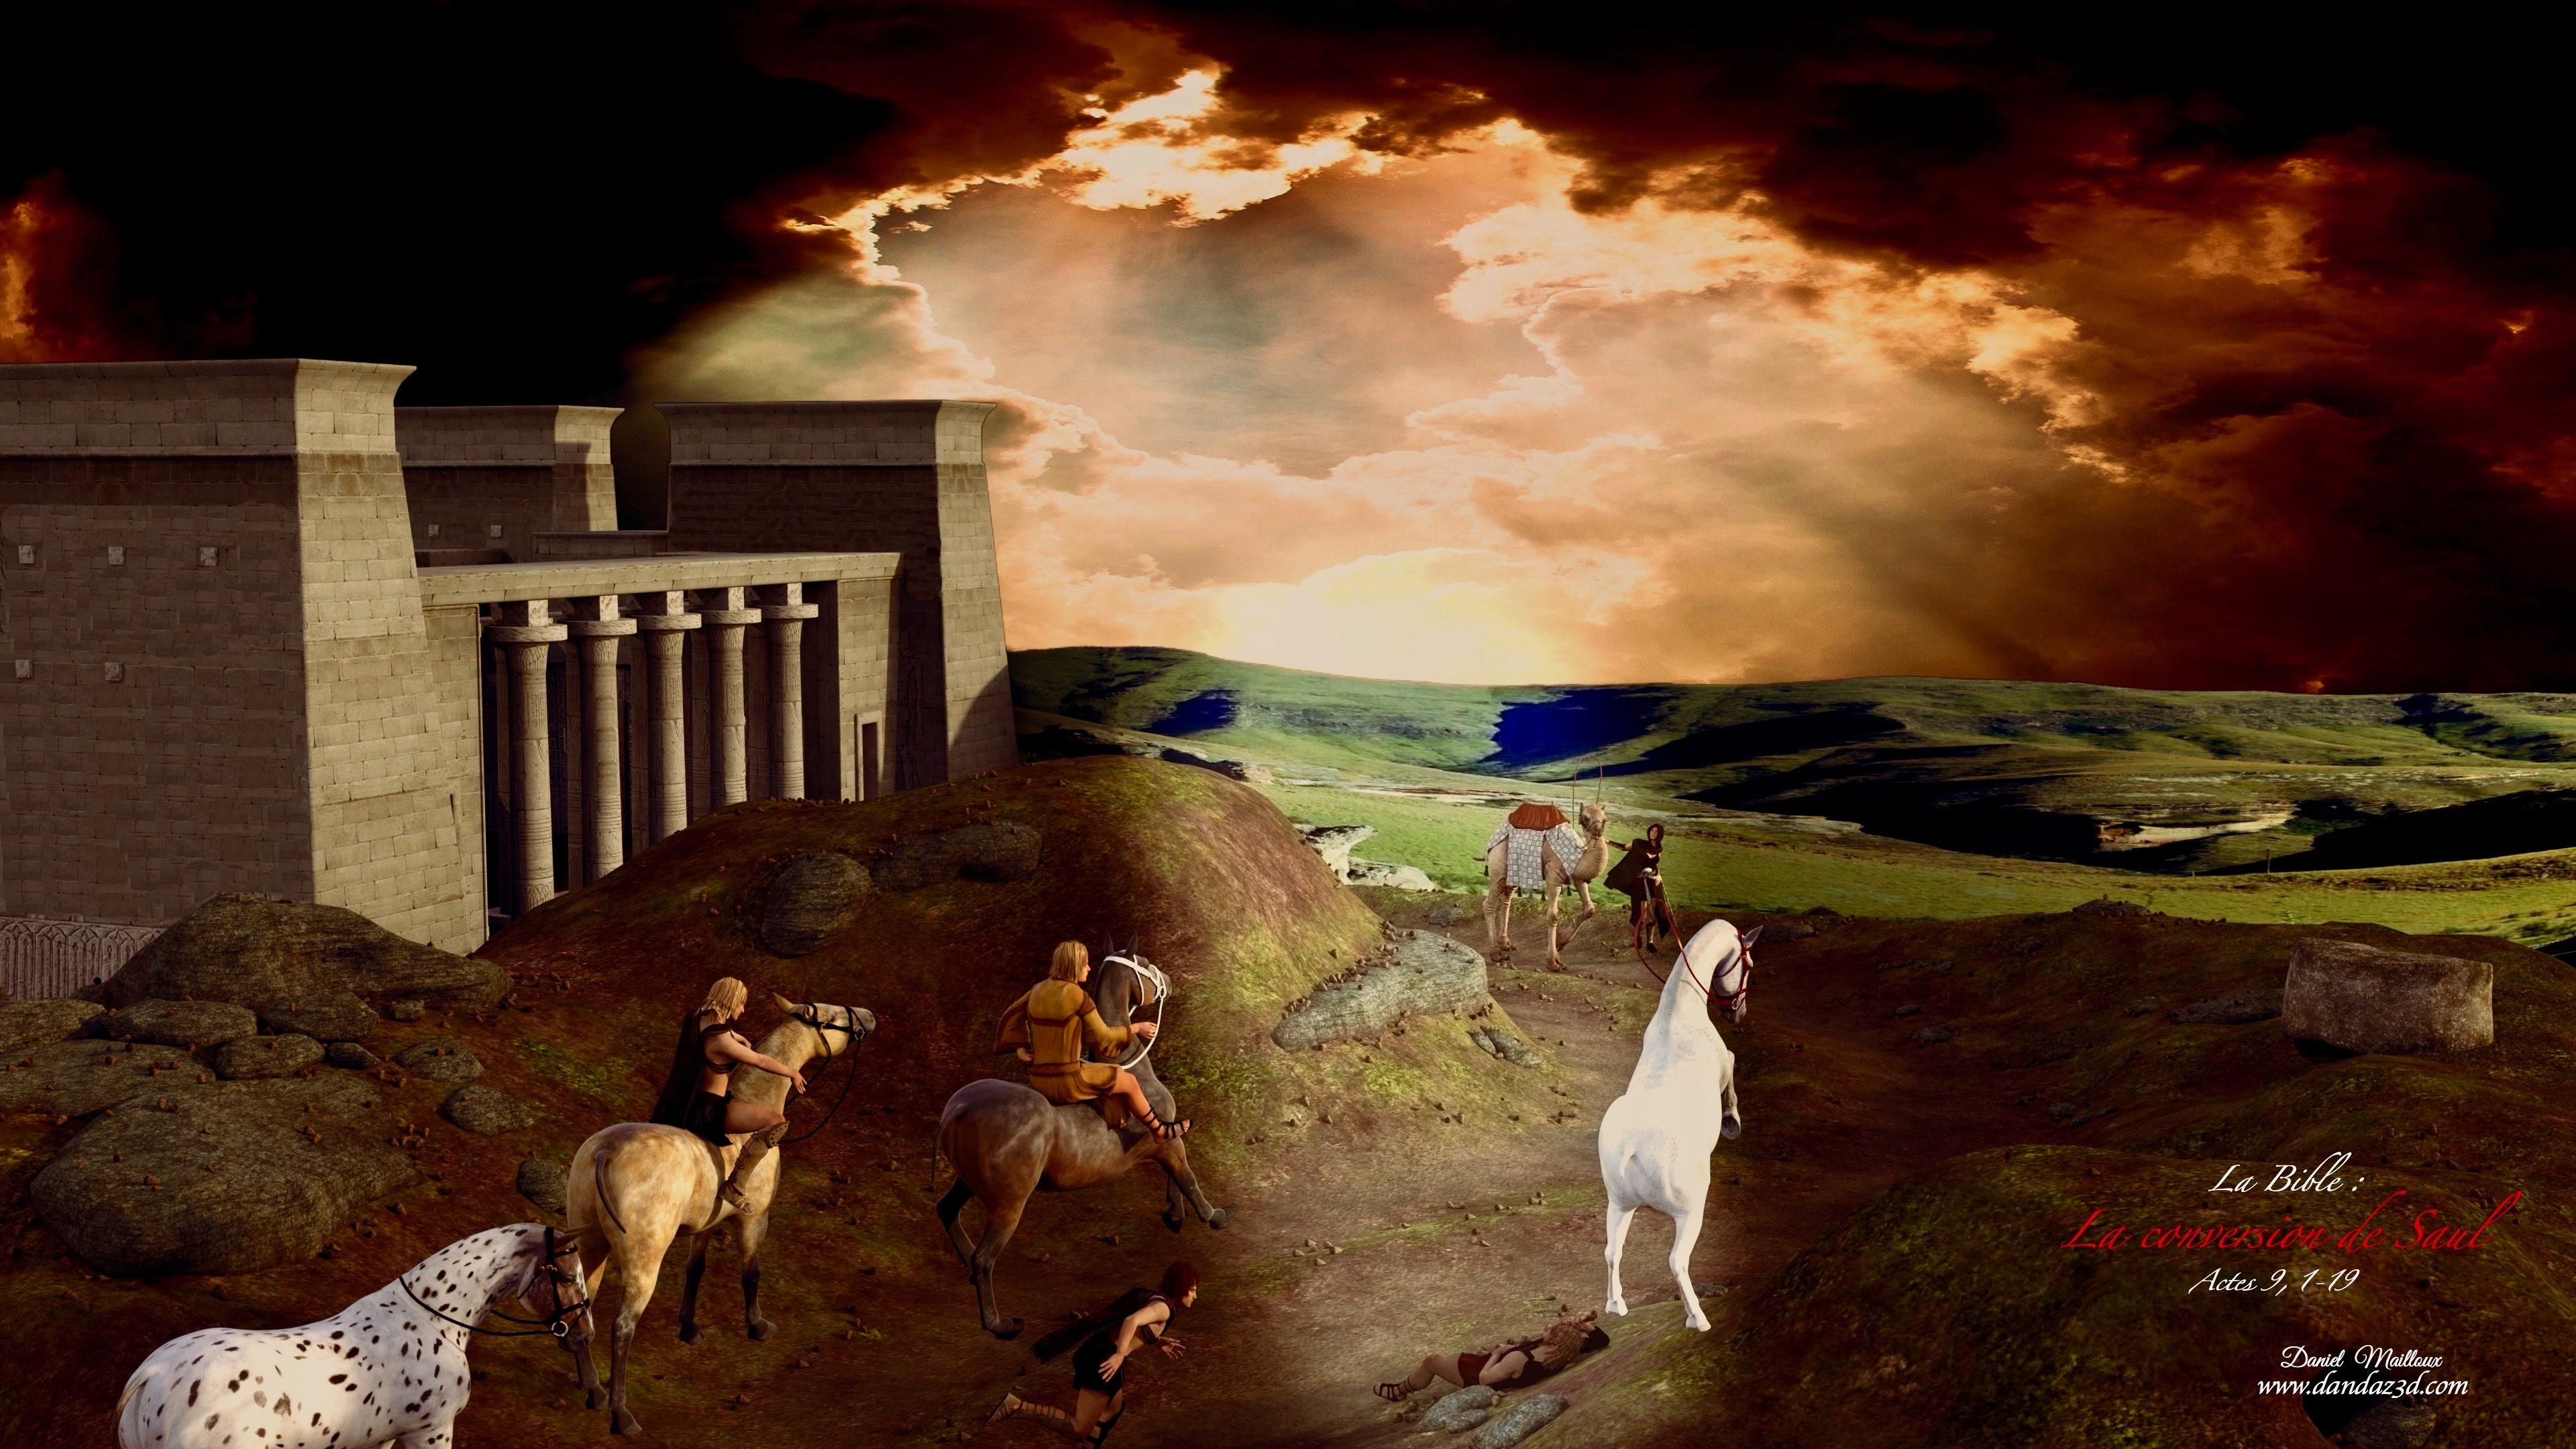 La conversion de Saul